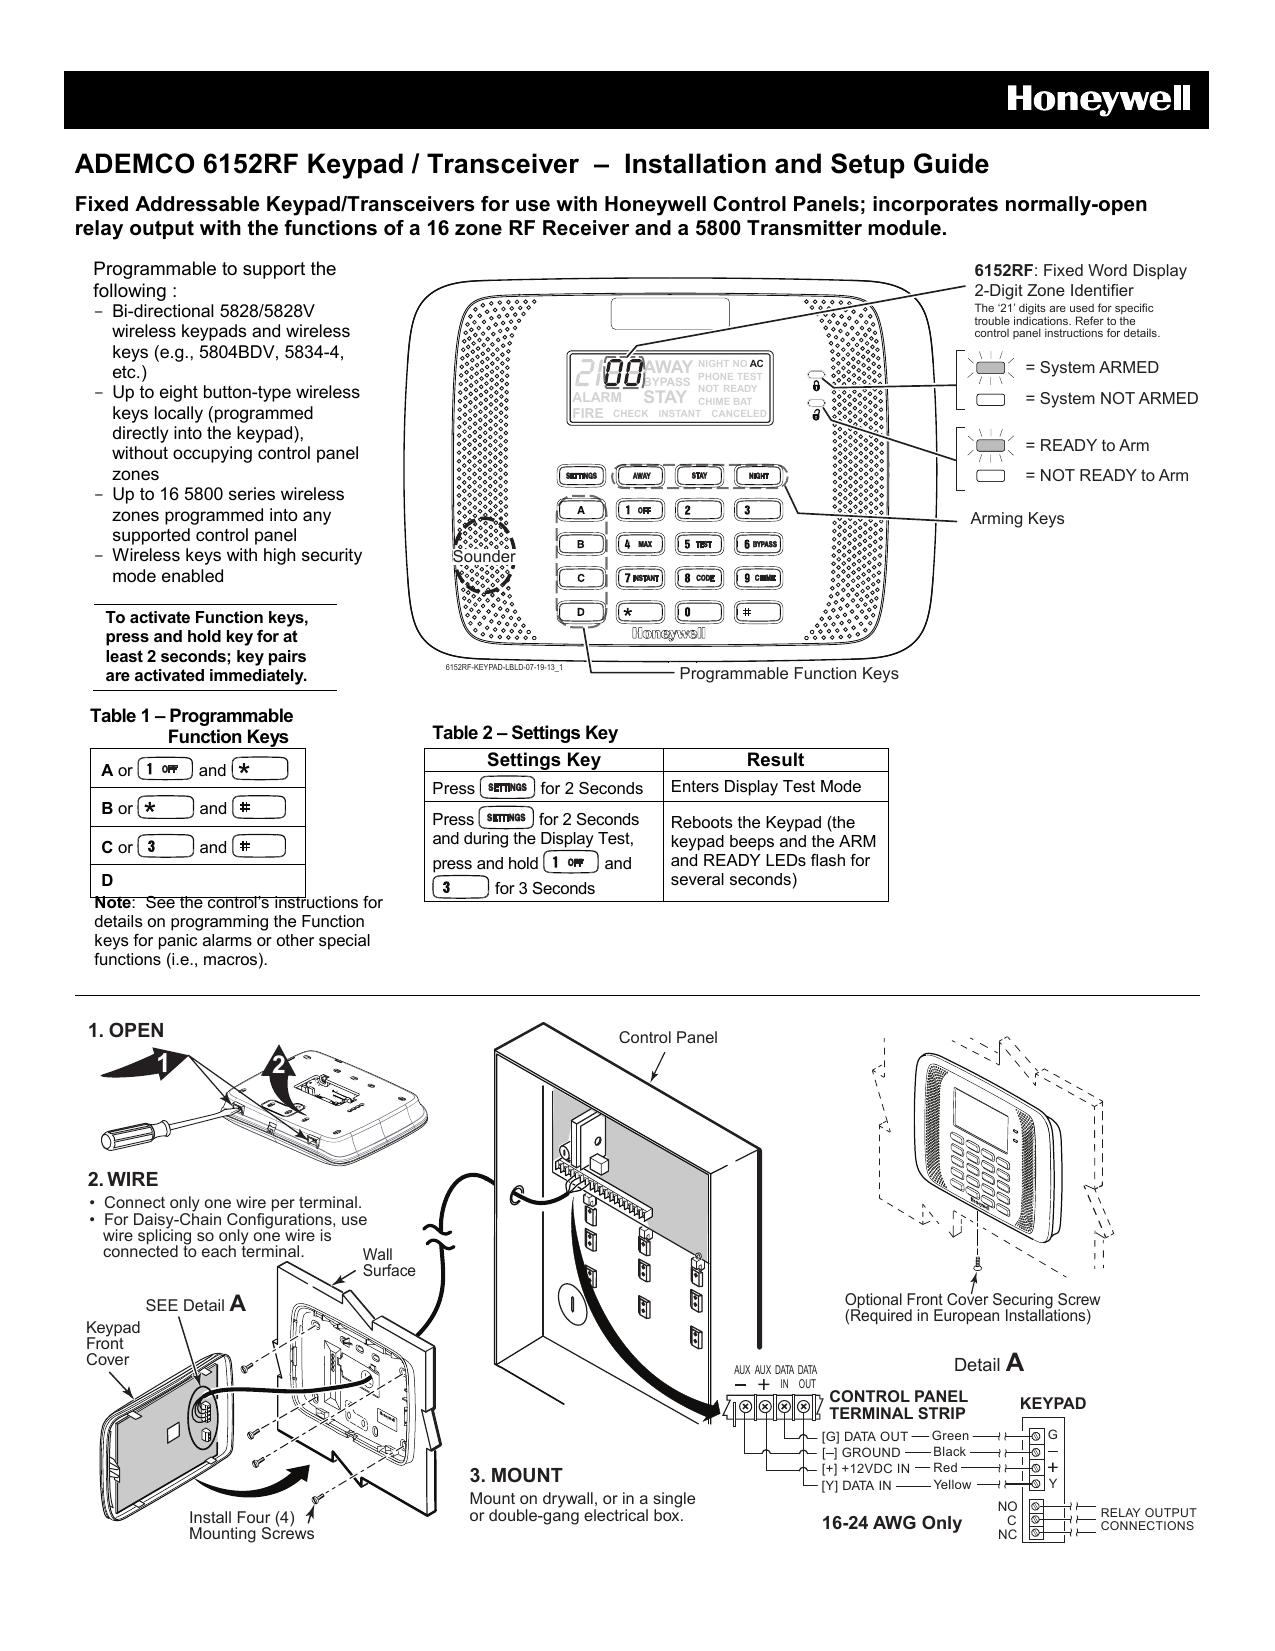 ADEMCO 6152RF Keypad / Transceiver – Installation and Setup ... on wiring diagrams for peterbilt trucks, flywheel key, ford key, valve key, honda key, tractor key, radiator key,